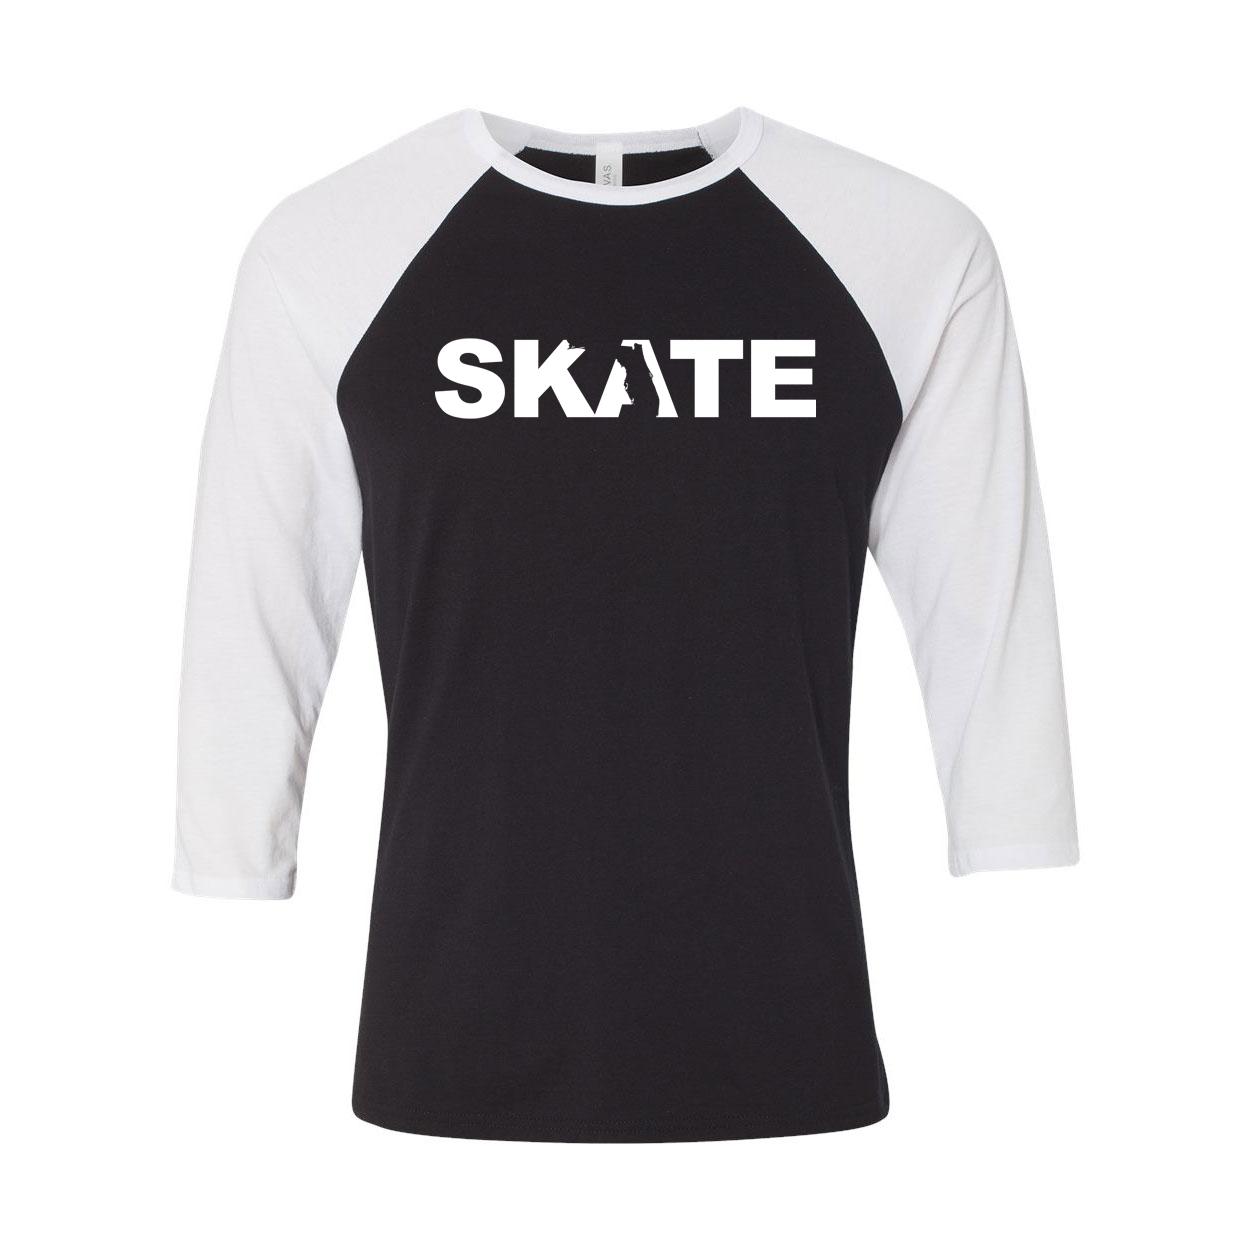 Skate Florida Classic Raglan Shirt Black/White (White Logo)